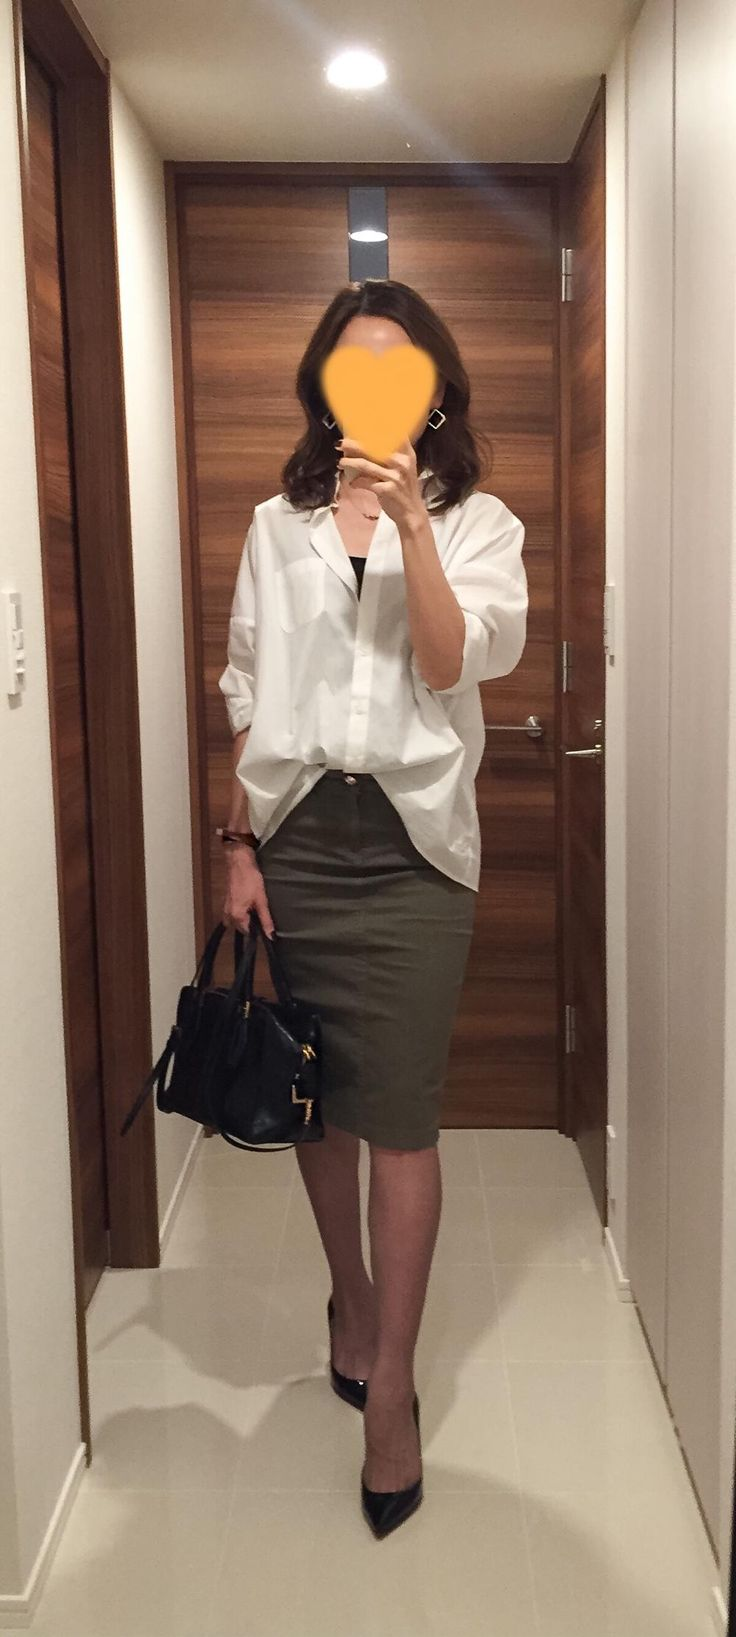 White shirt: SISLEY, Khaki skirt: Deuxieme Classe, Bag: Tod's, Pumps: Christian Loboutin